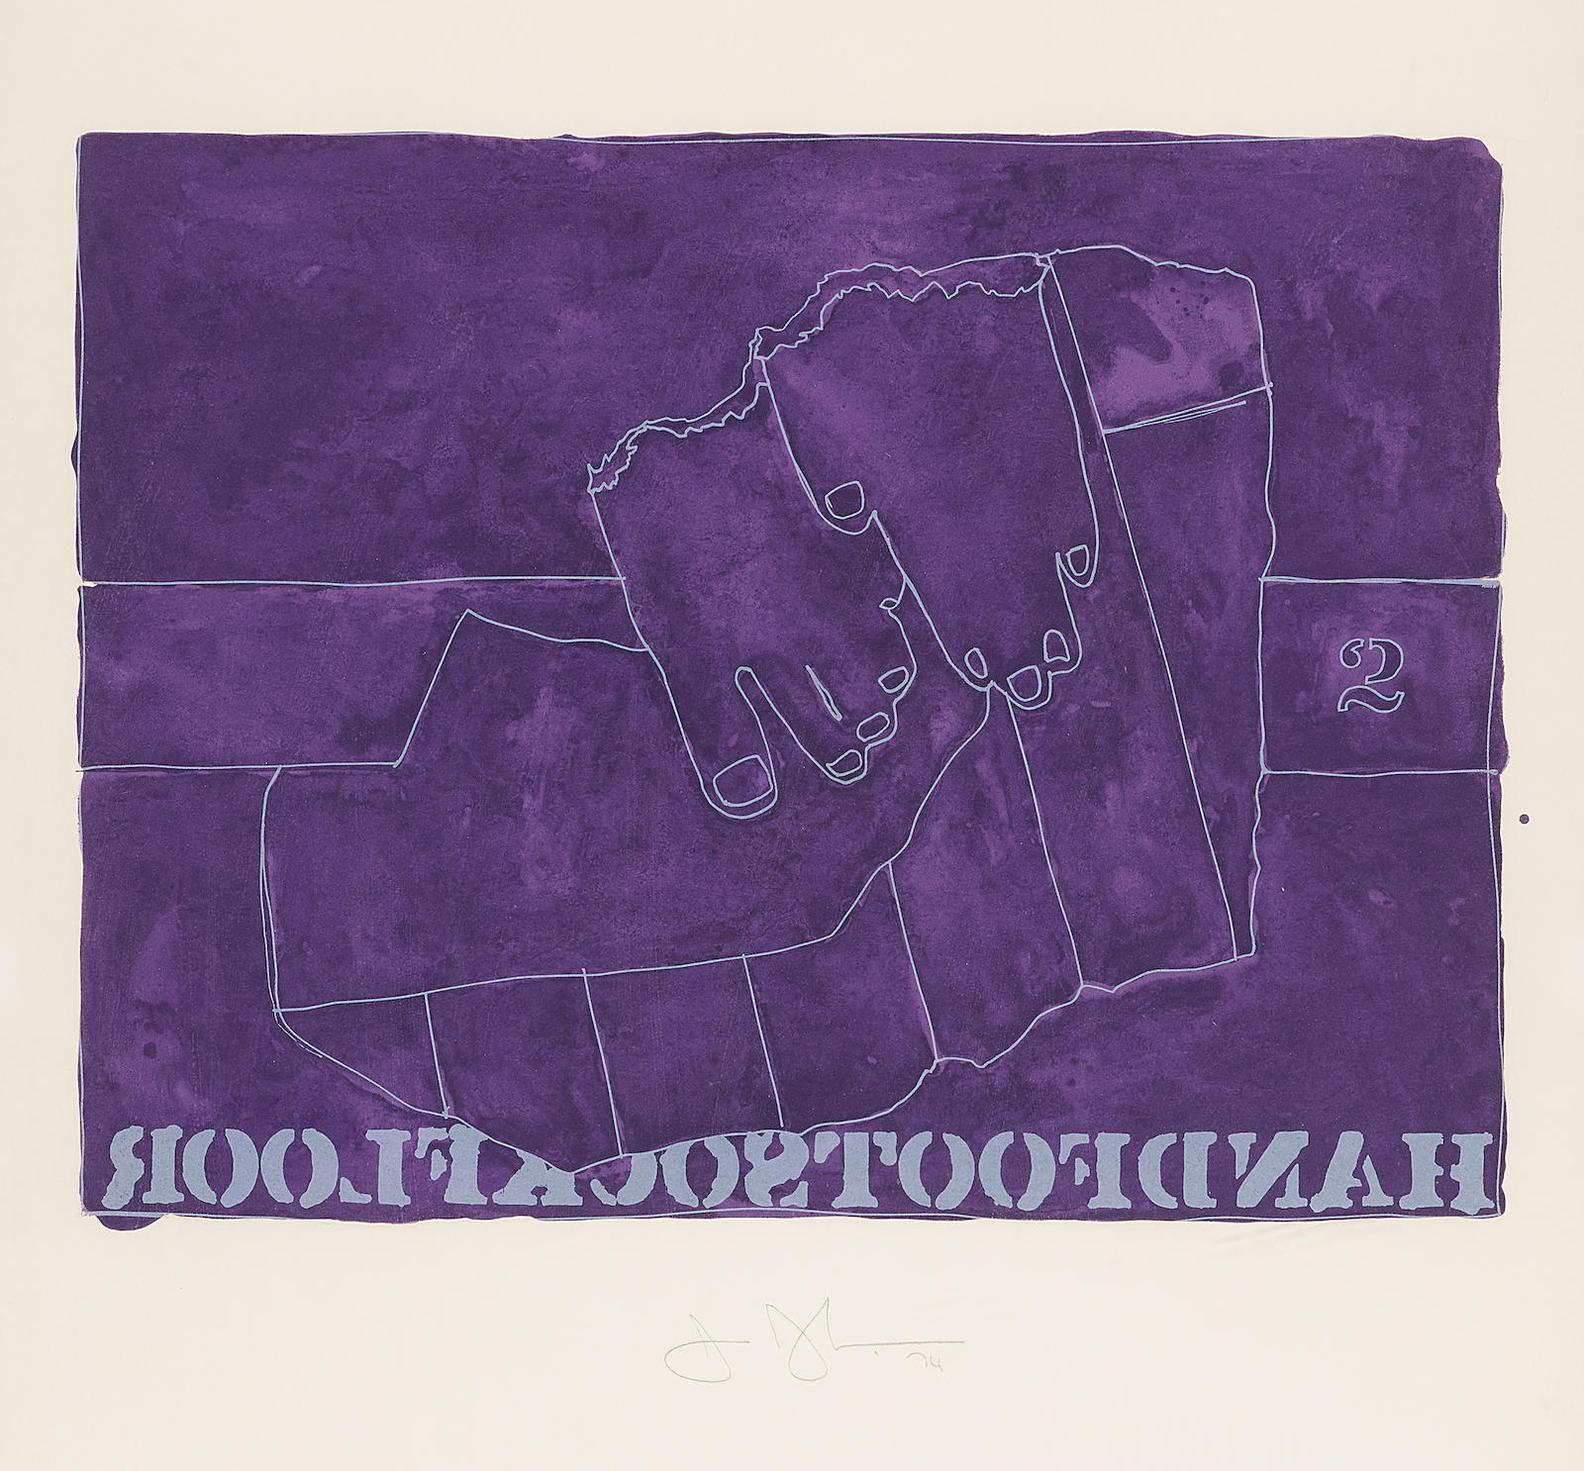 Jasper Johns-Handfootsockfloor, From Casts From Untitled-1974